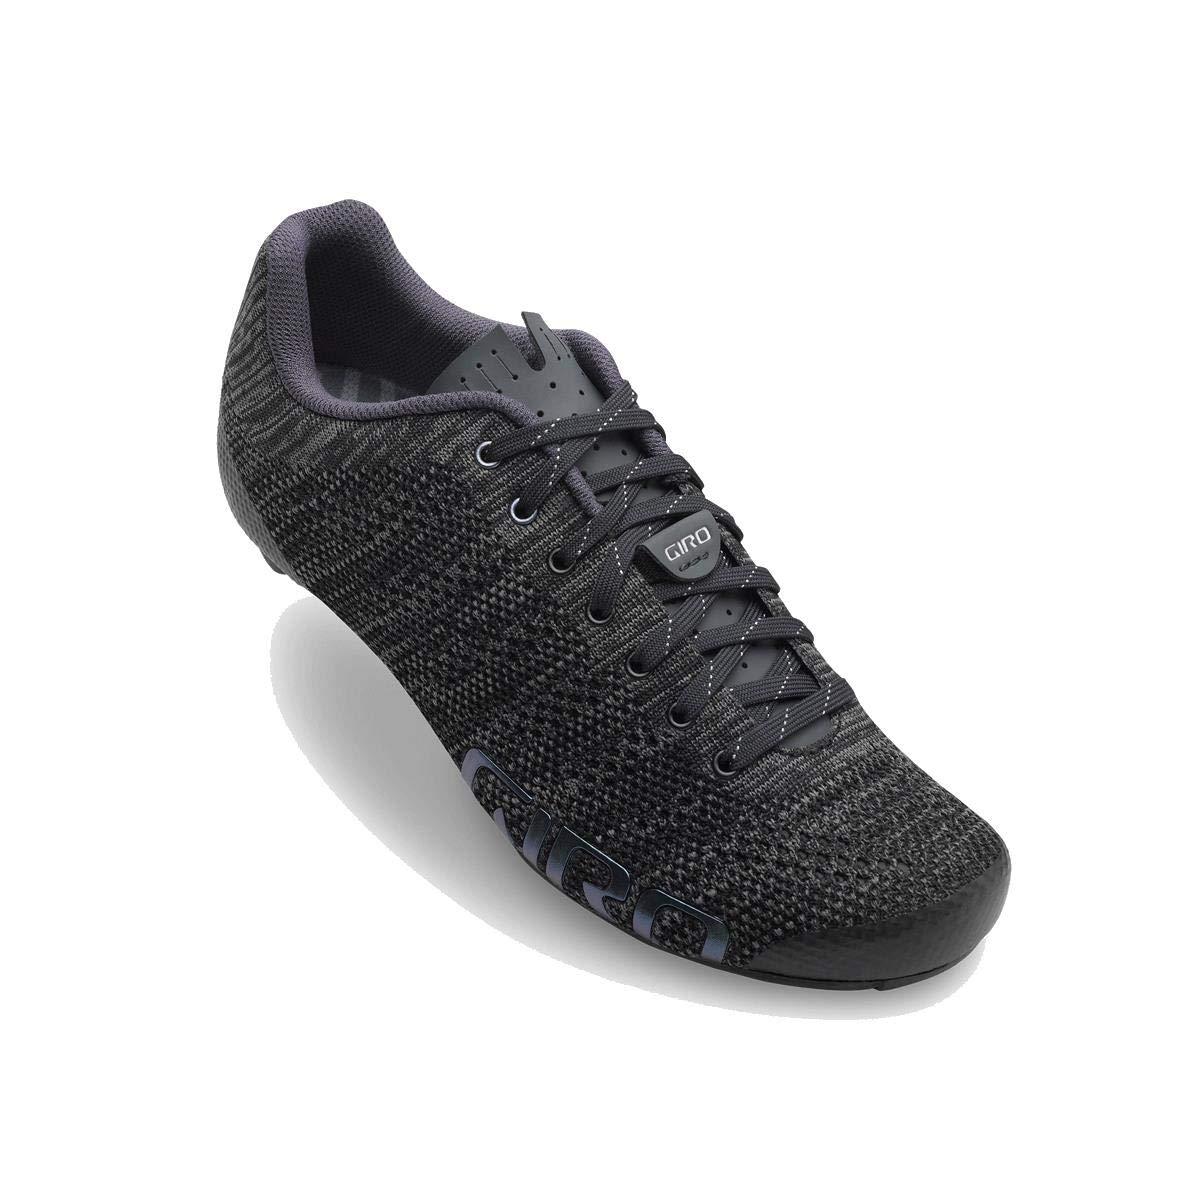 Giro Empire e70ニットサイクリング靴 – Women 's 38 M EU ブラックヘザー B07GT6LTW4